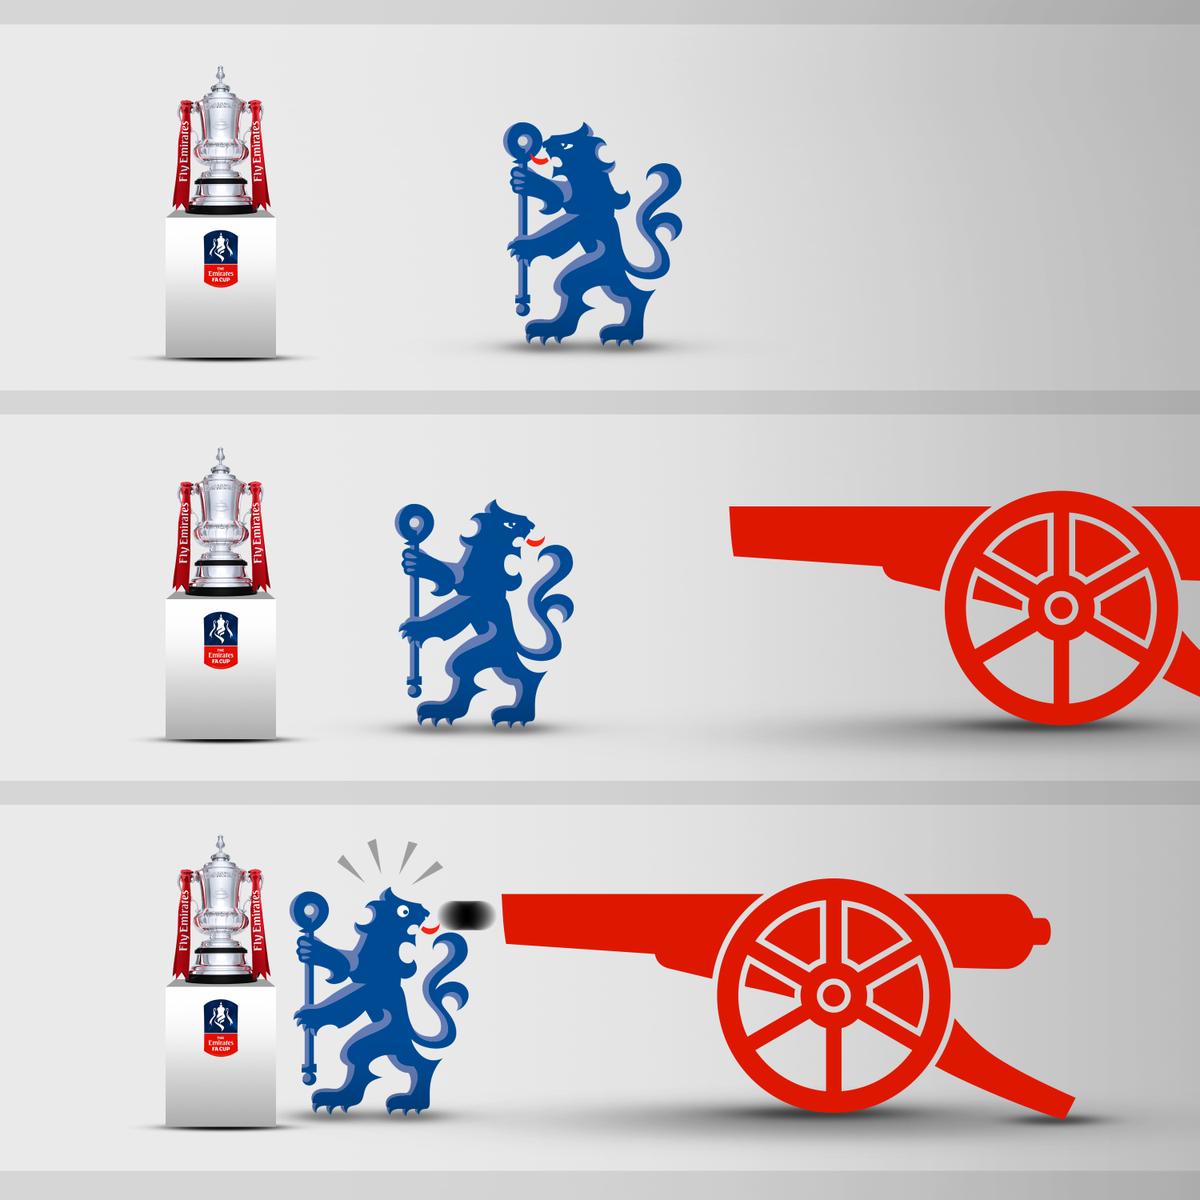 #Arsenal 🏆 #FACup